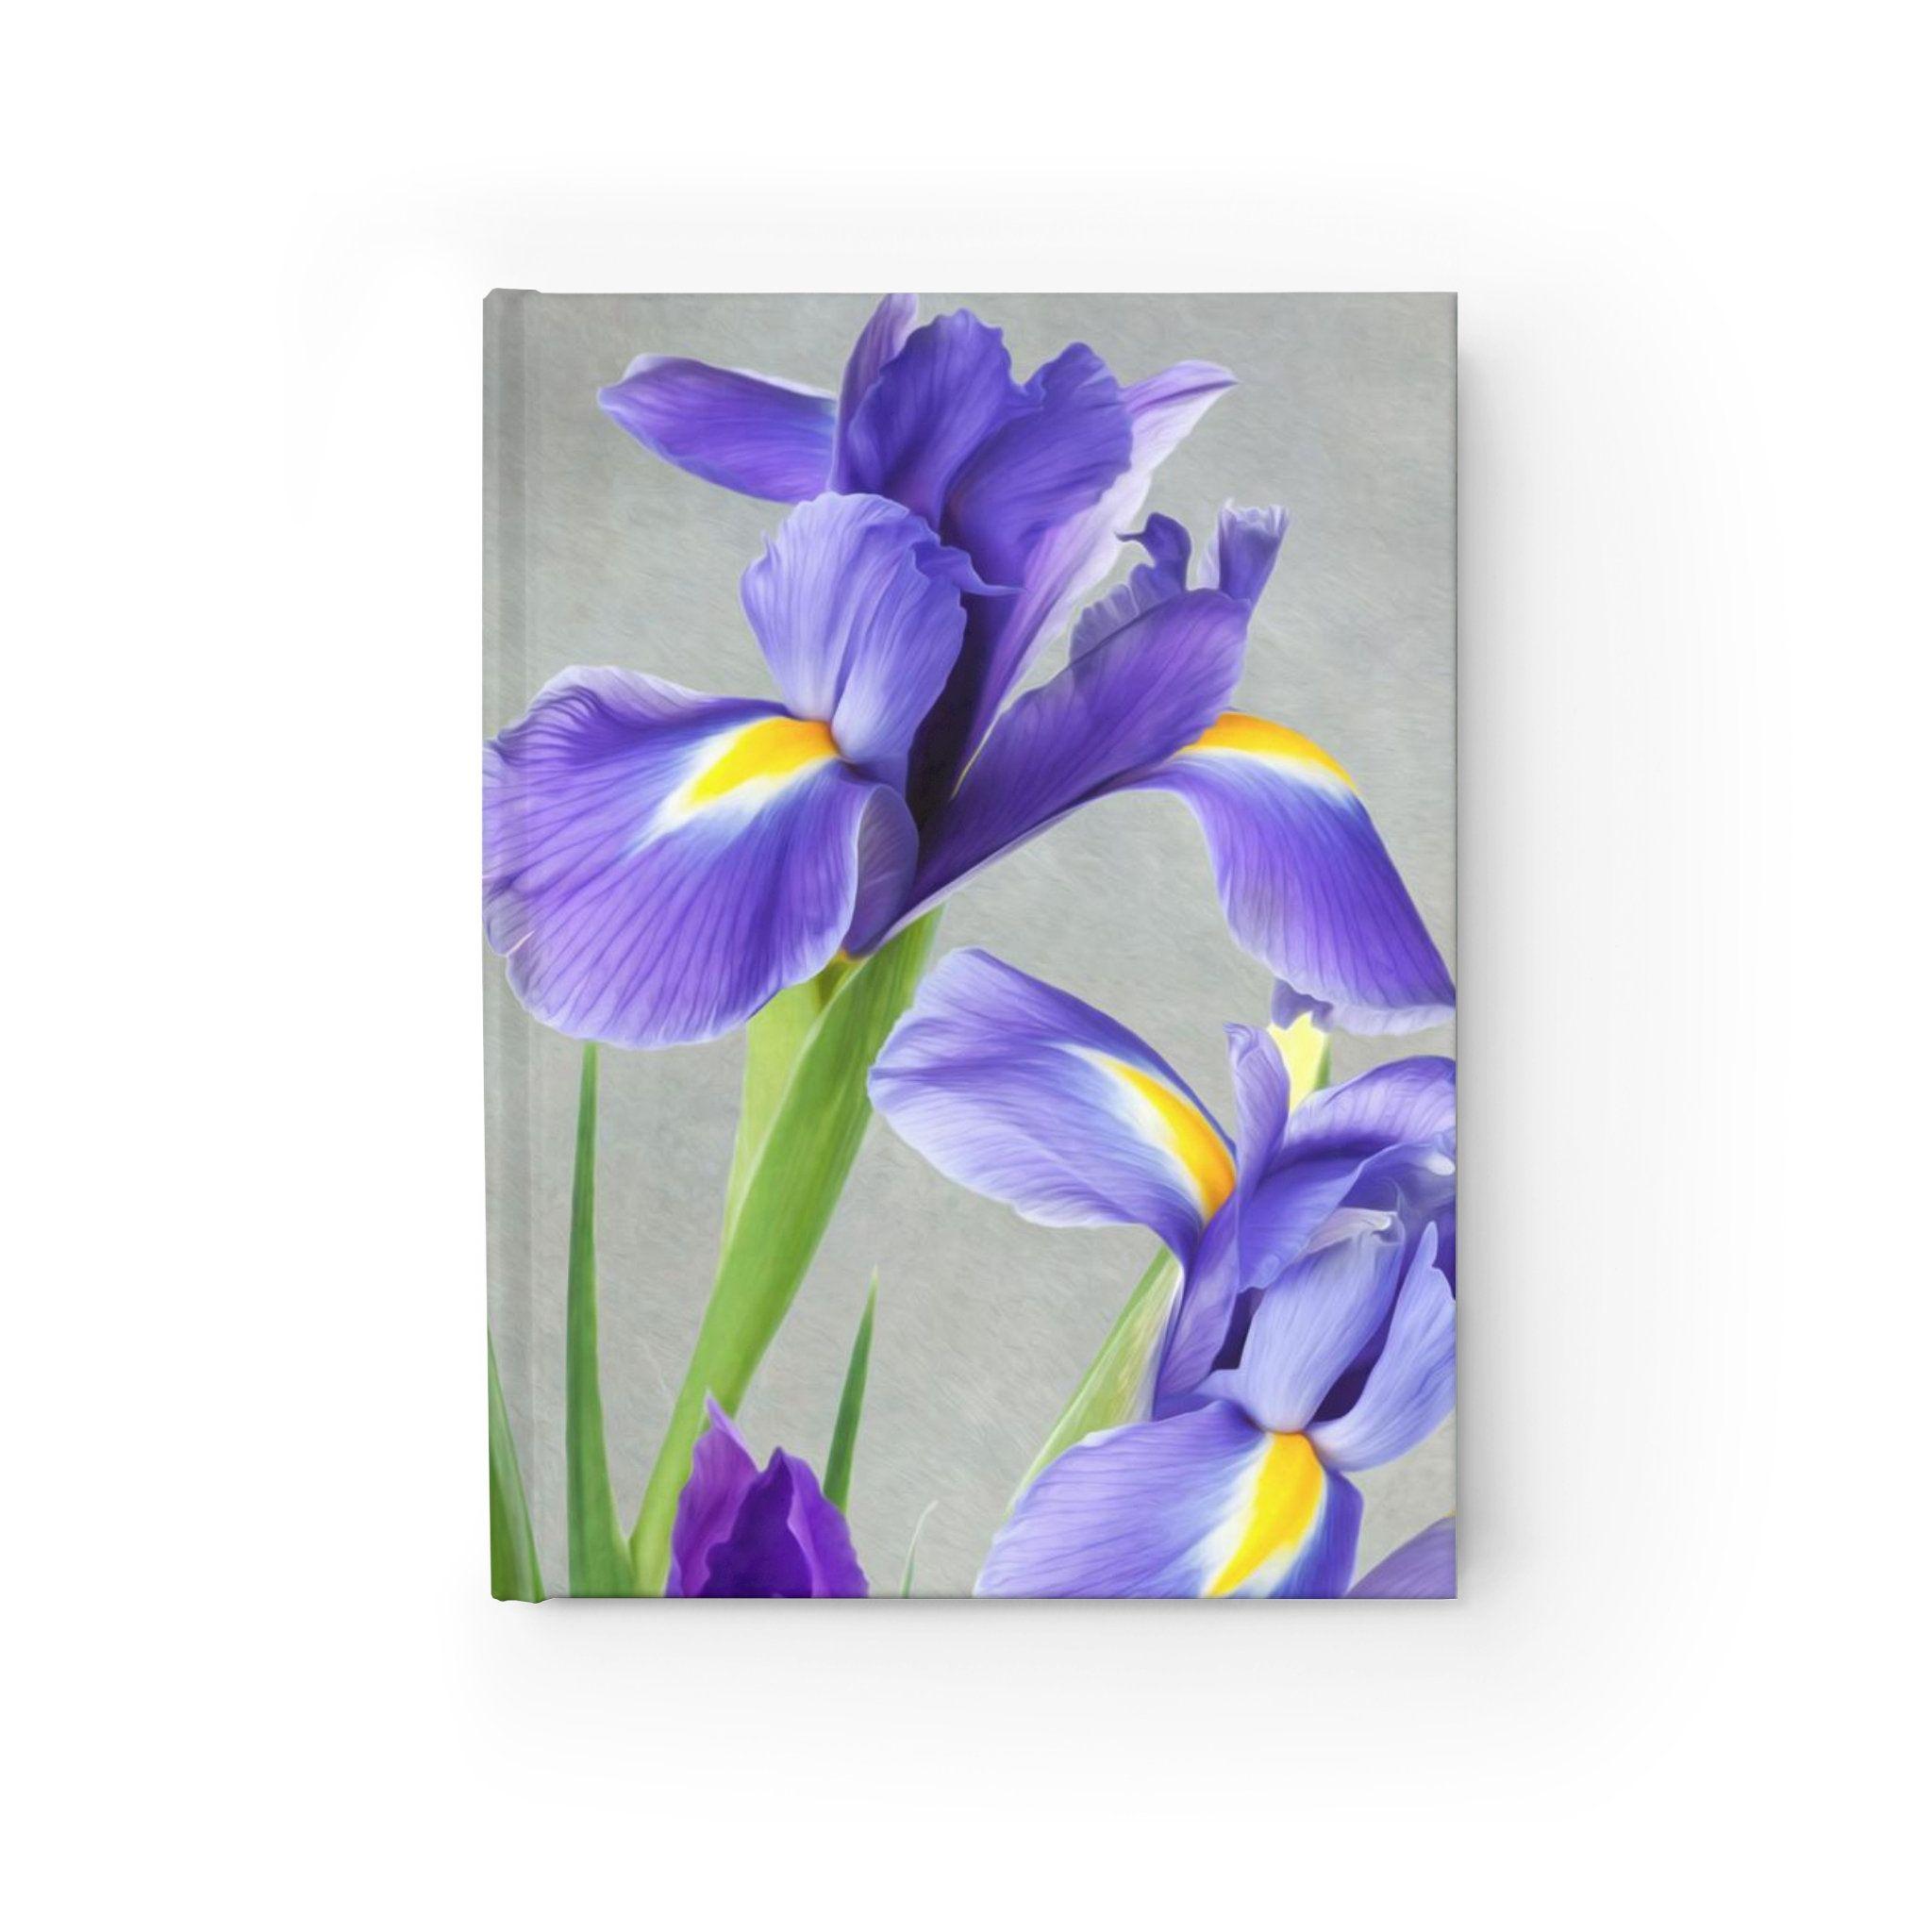 Purple Iris Flowers Hardcover Journal Original Artwork Writing Journal Personal Diary Small Sketchbook Flower Lovers Gift Ideas Purple Iris Flowers Iris Flowers Small Sketchbook